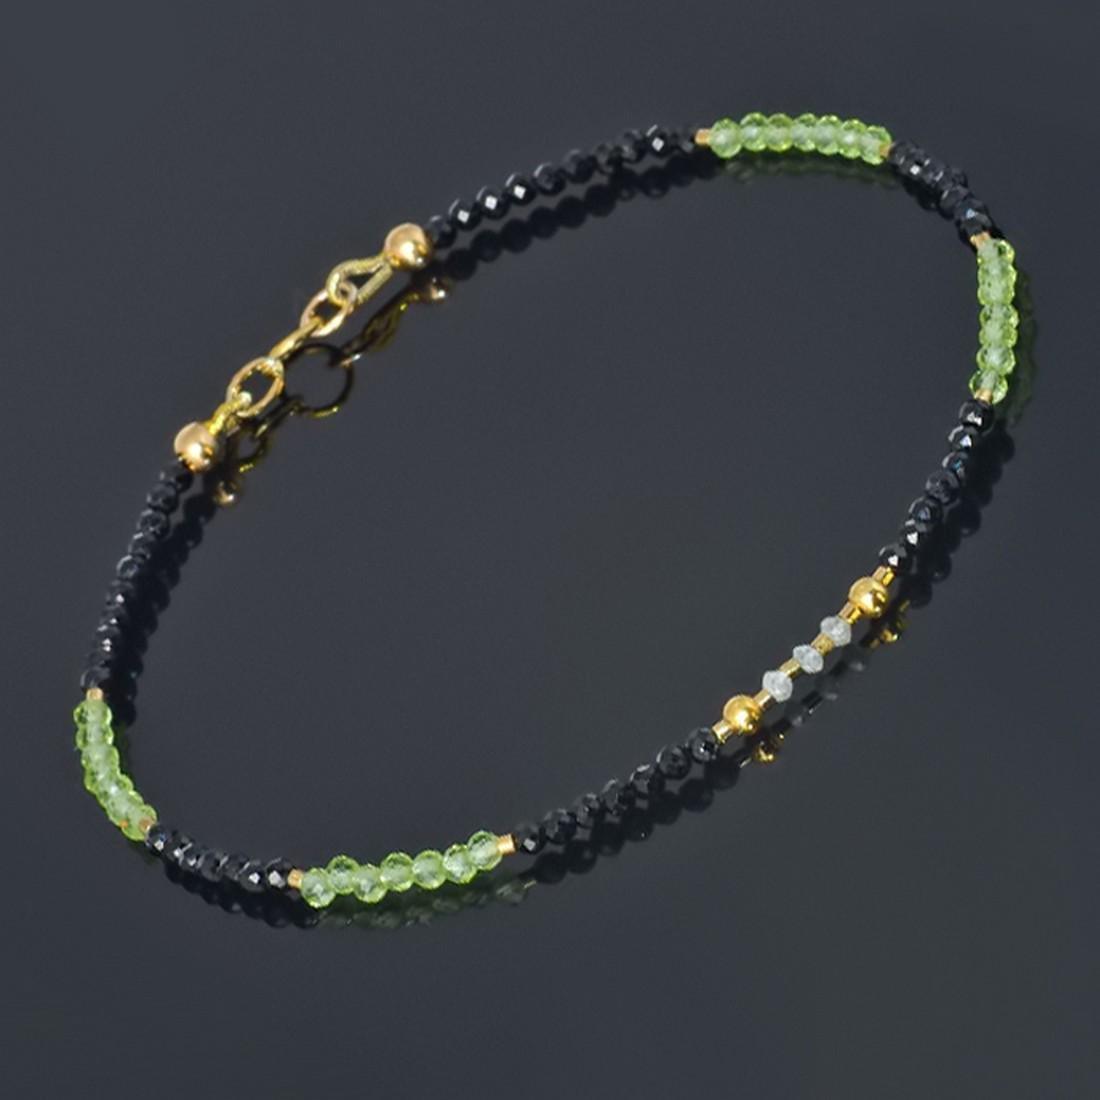 14K Sapphire and Emerald and Diamonds 0.2ctw Bracelet - 4